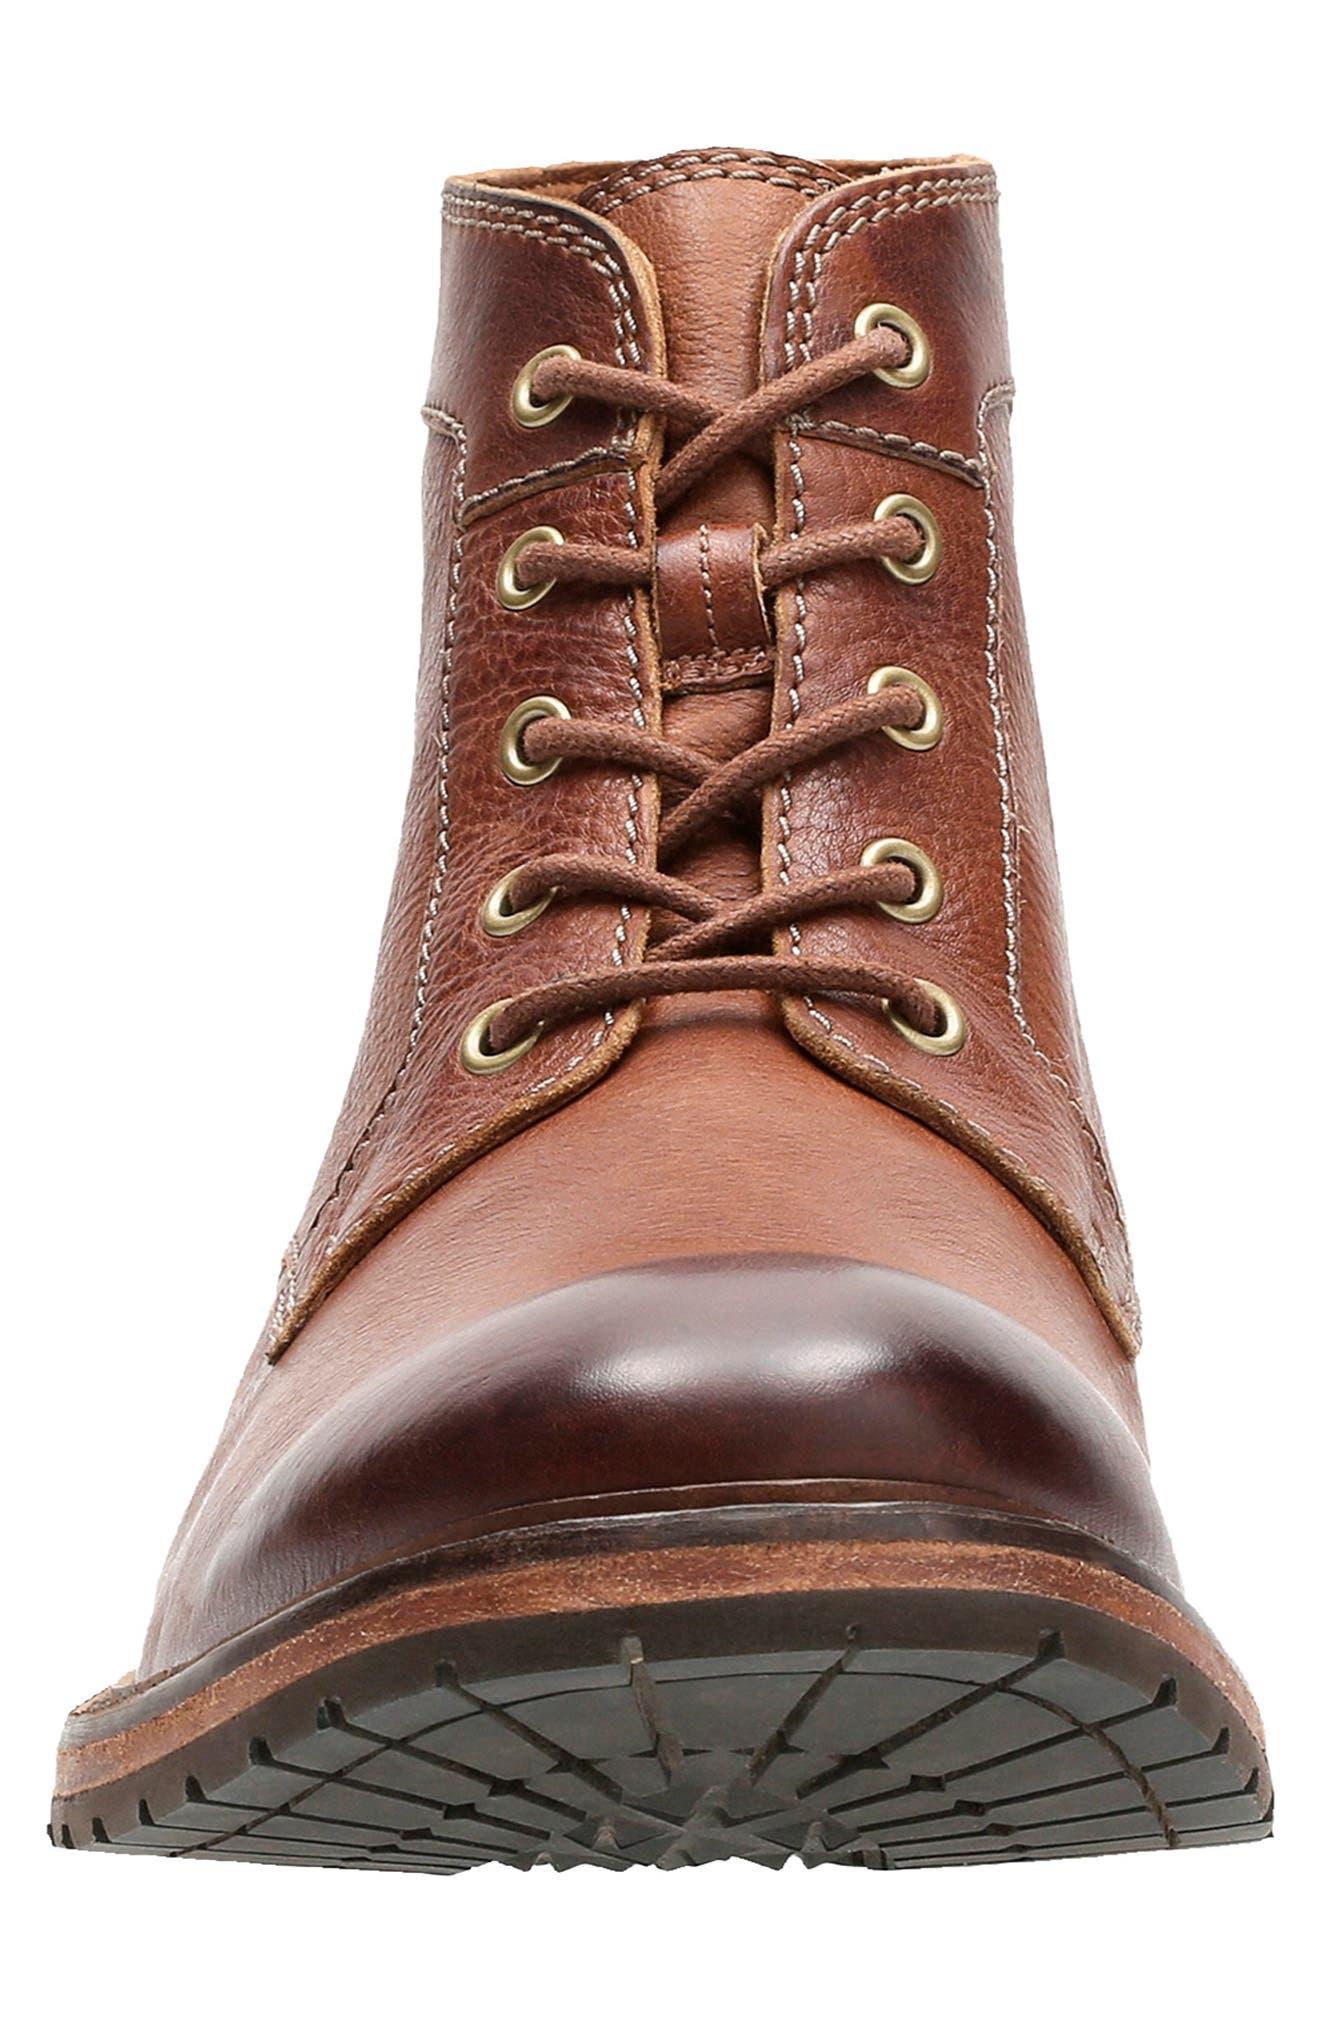 Clarkdale Bud Plain Toe Boot,                             Alternate thumbnail 2, color,                             DARK TAN LEATHER